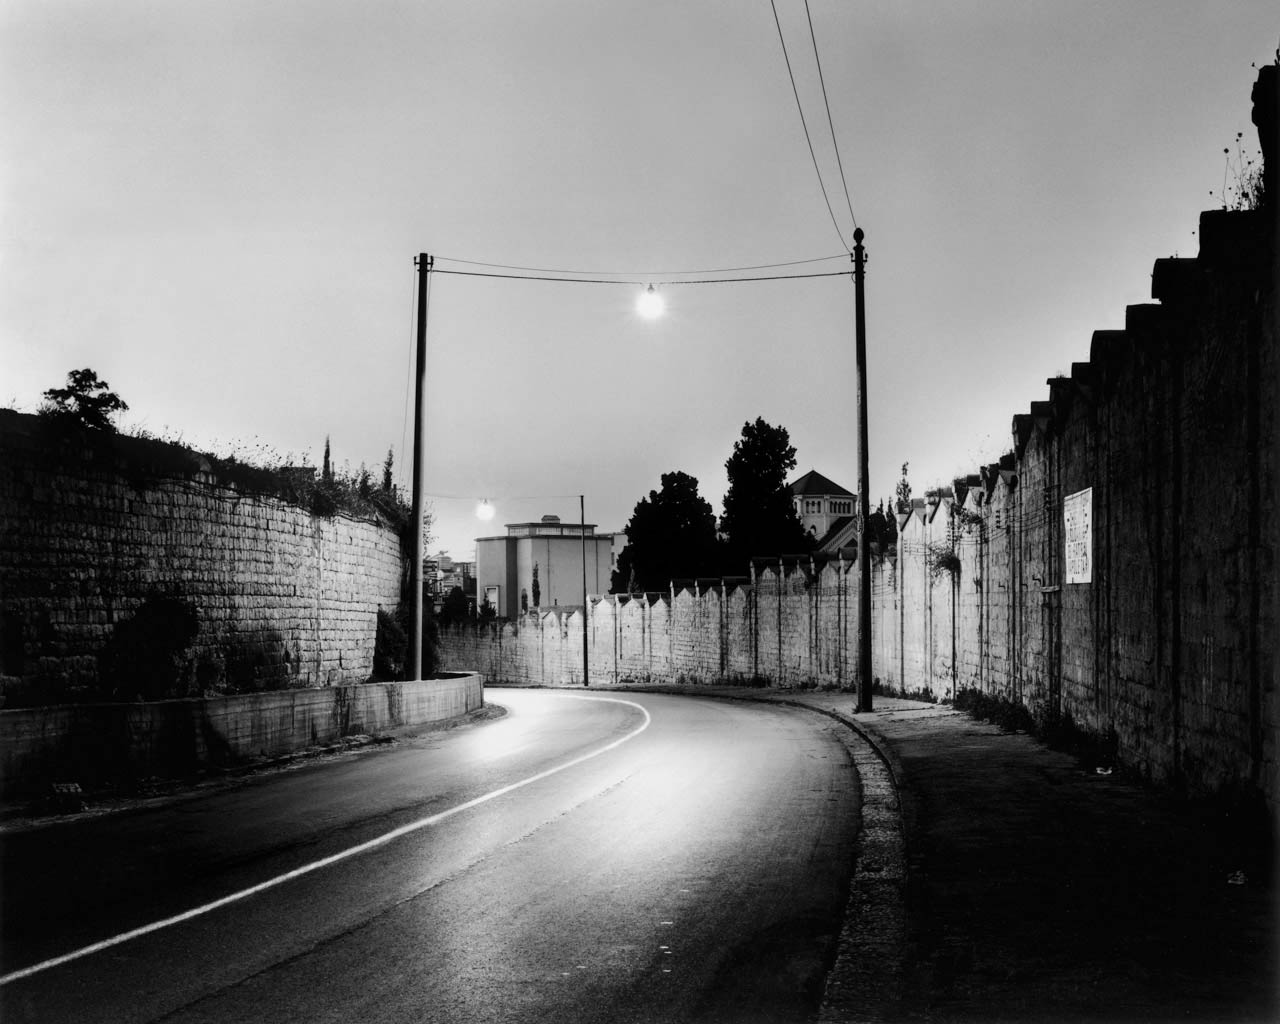 Via Santa Maria del Pianto, Napoli, 2001 Stampa digitale su carta Hahnemuhle, cm 100x120 / cm 120x140 (ed. 6 + 1AP)